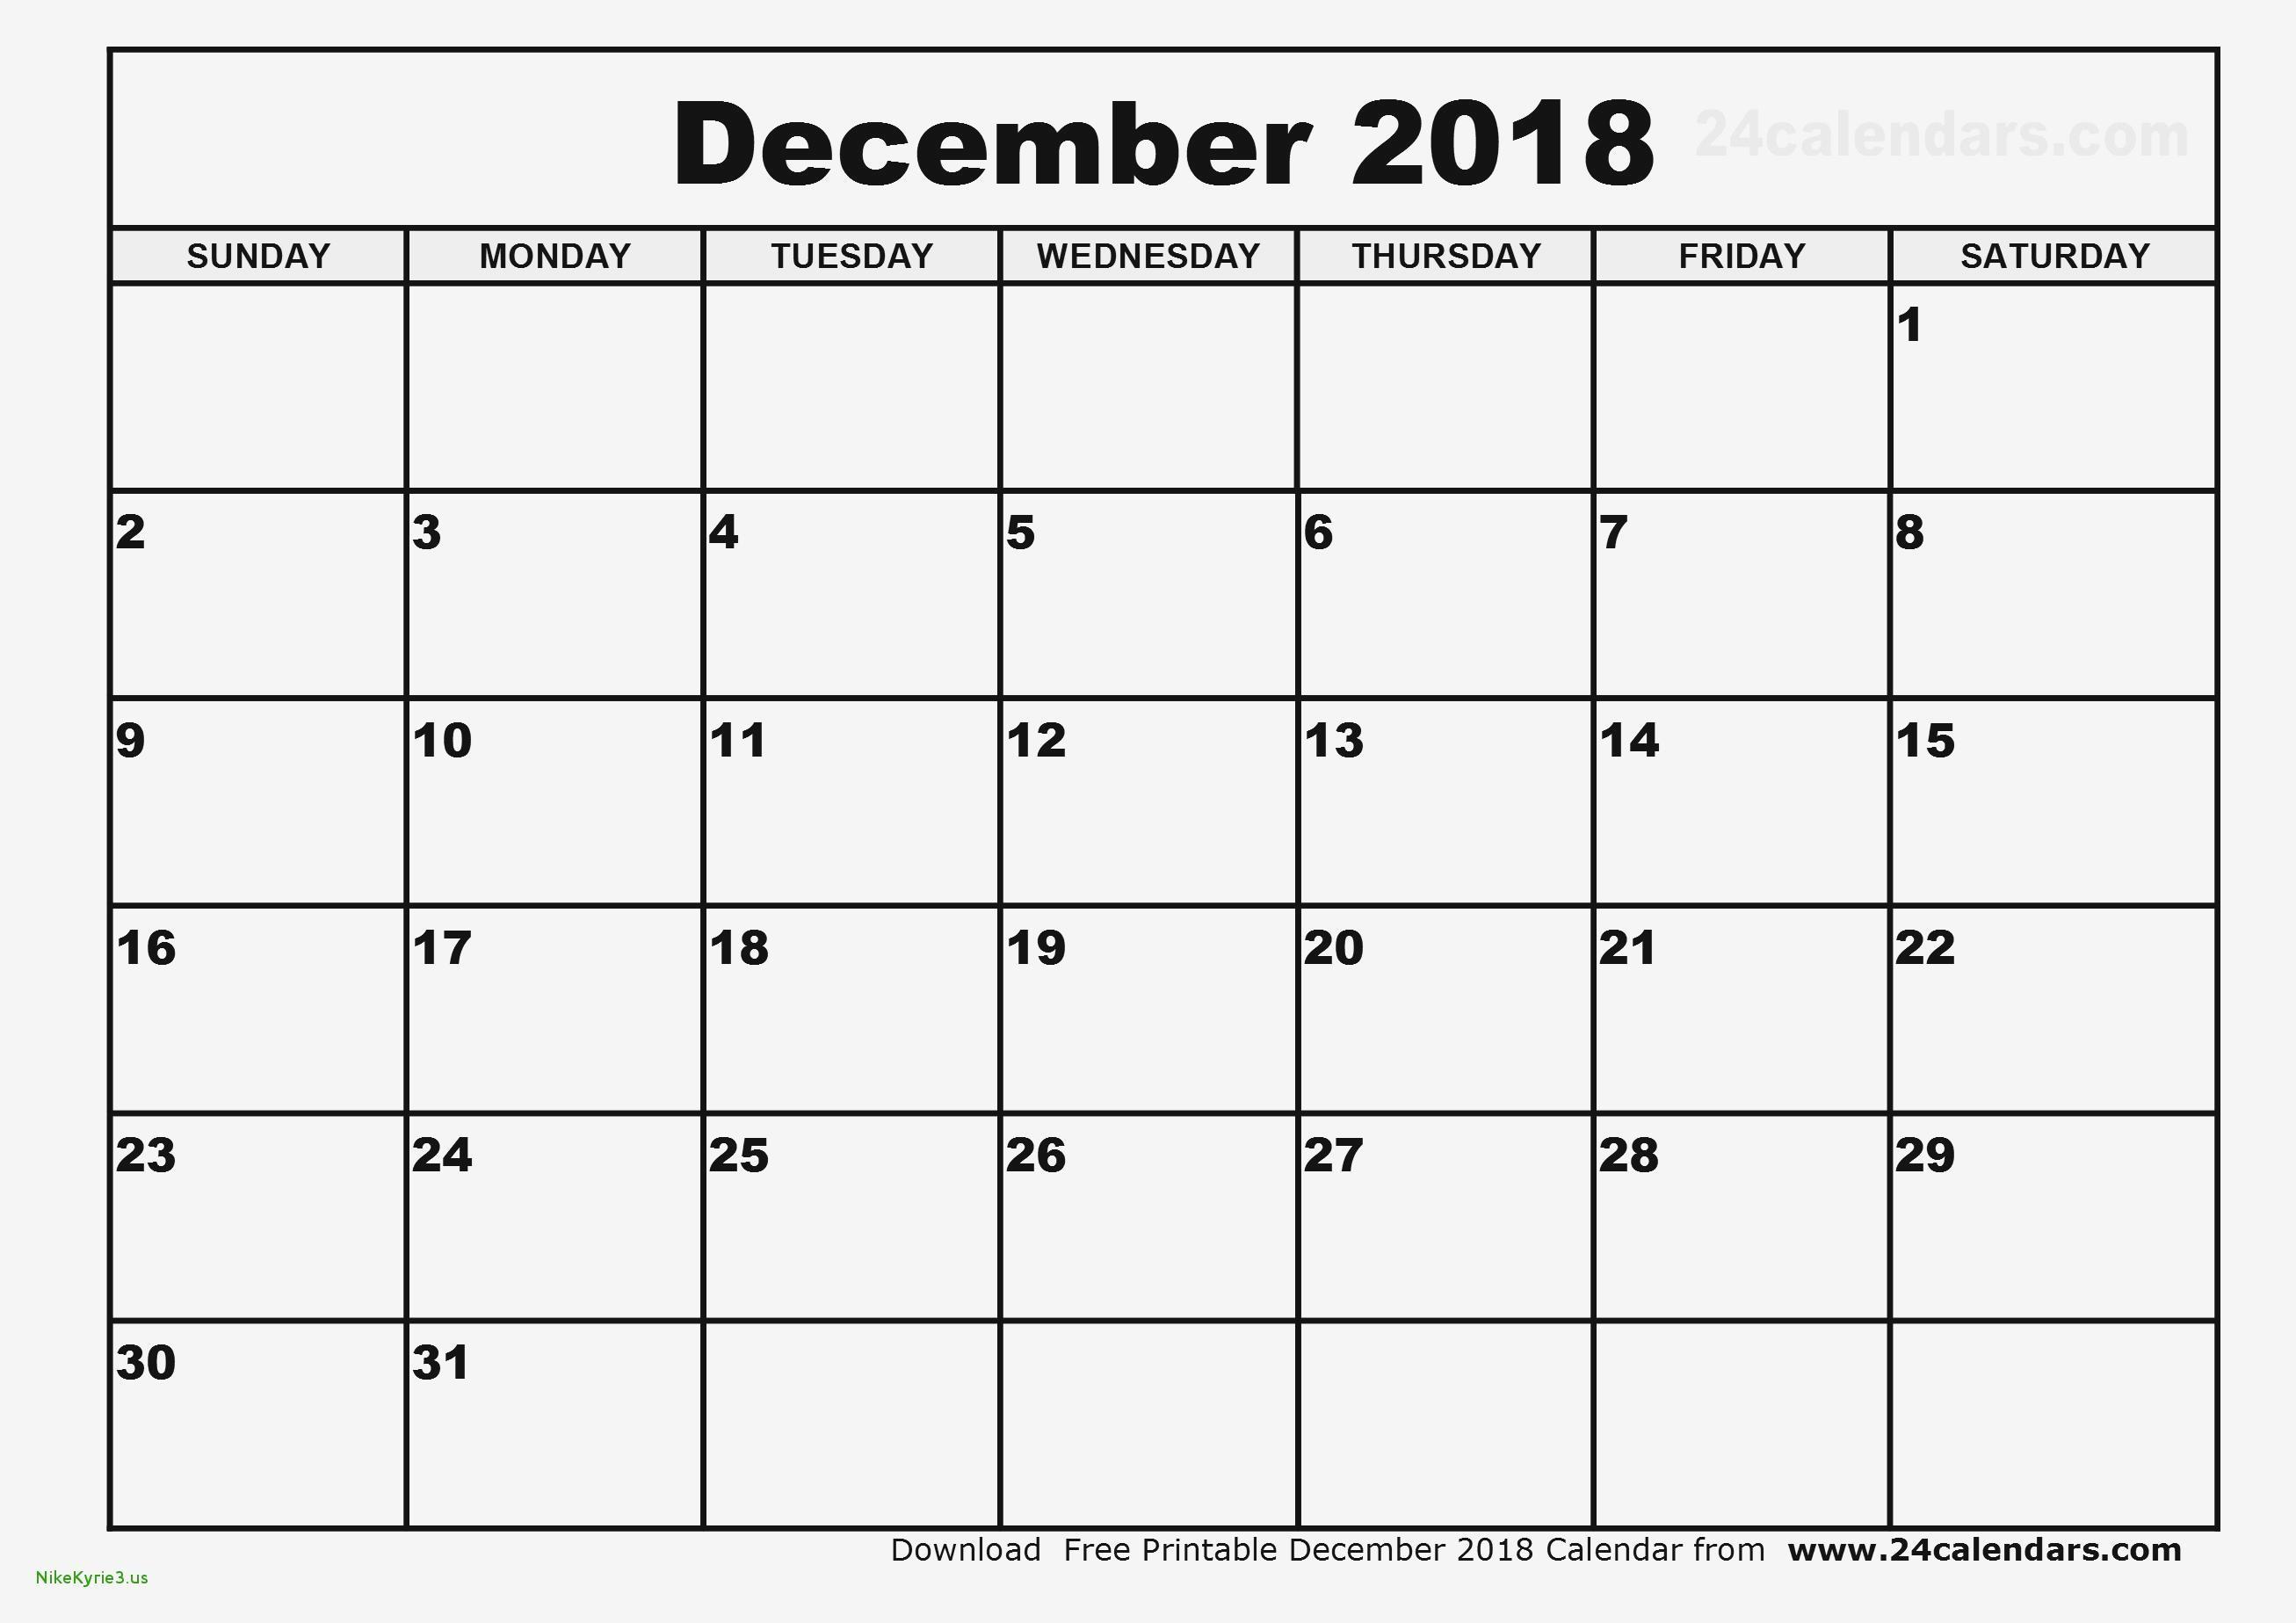 December 2018 Monthly Calendar Printable | Calendar Template with December Monthly Calendar Template